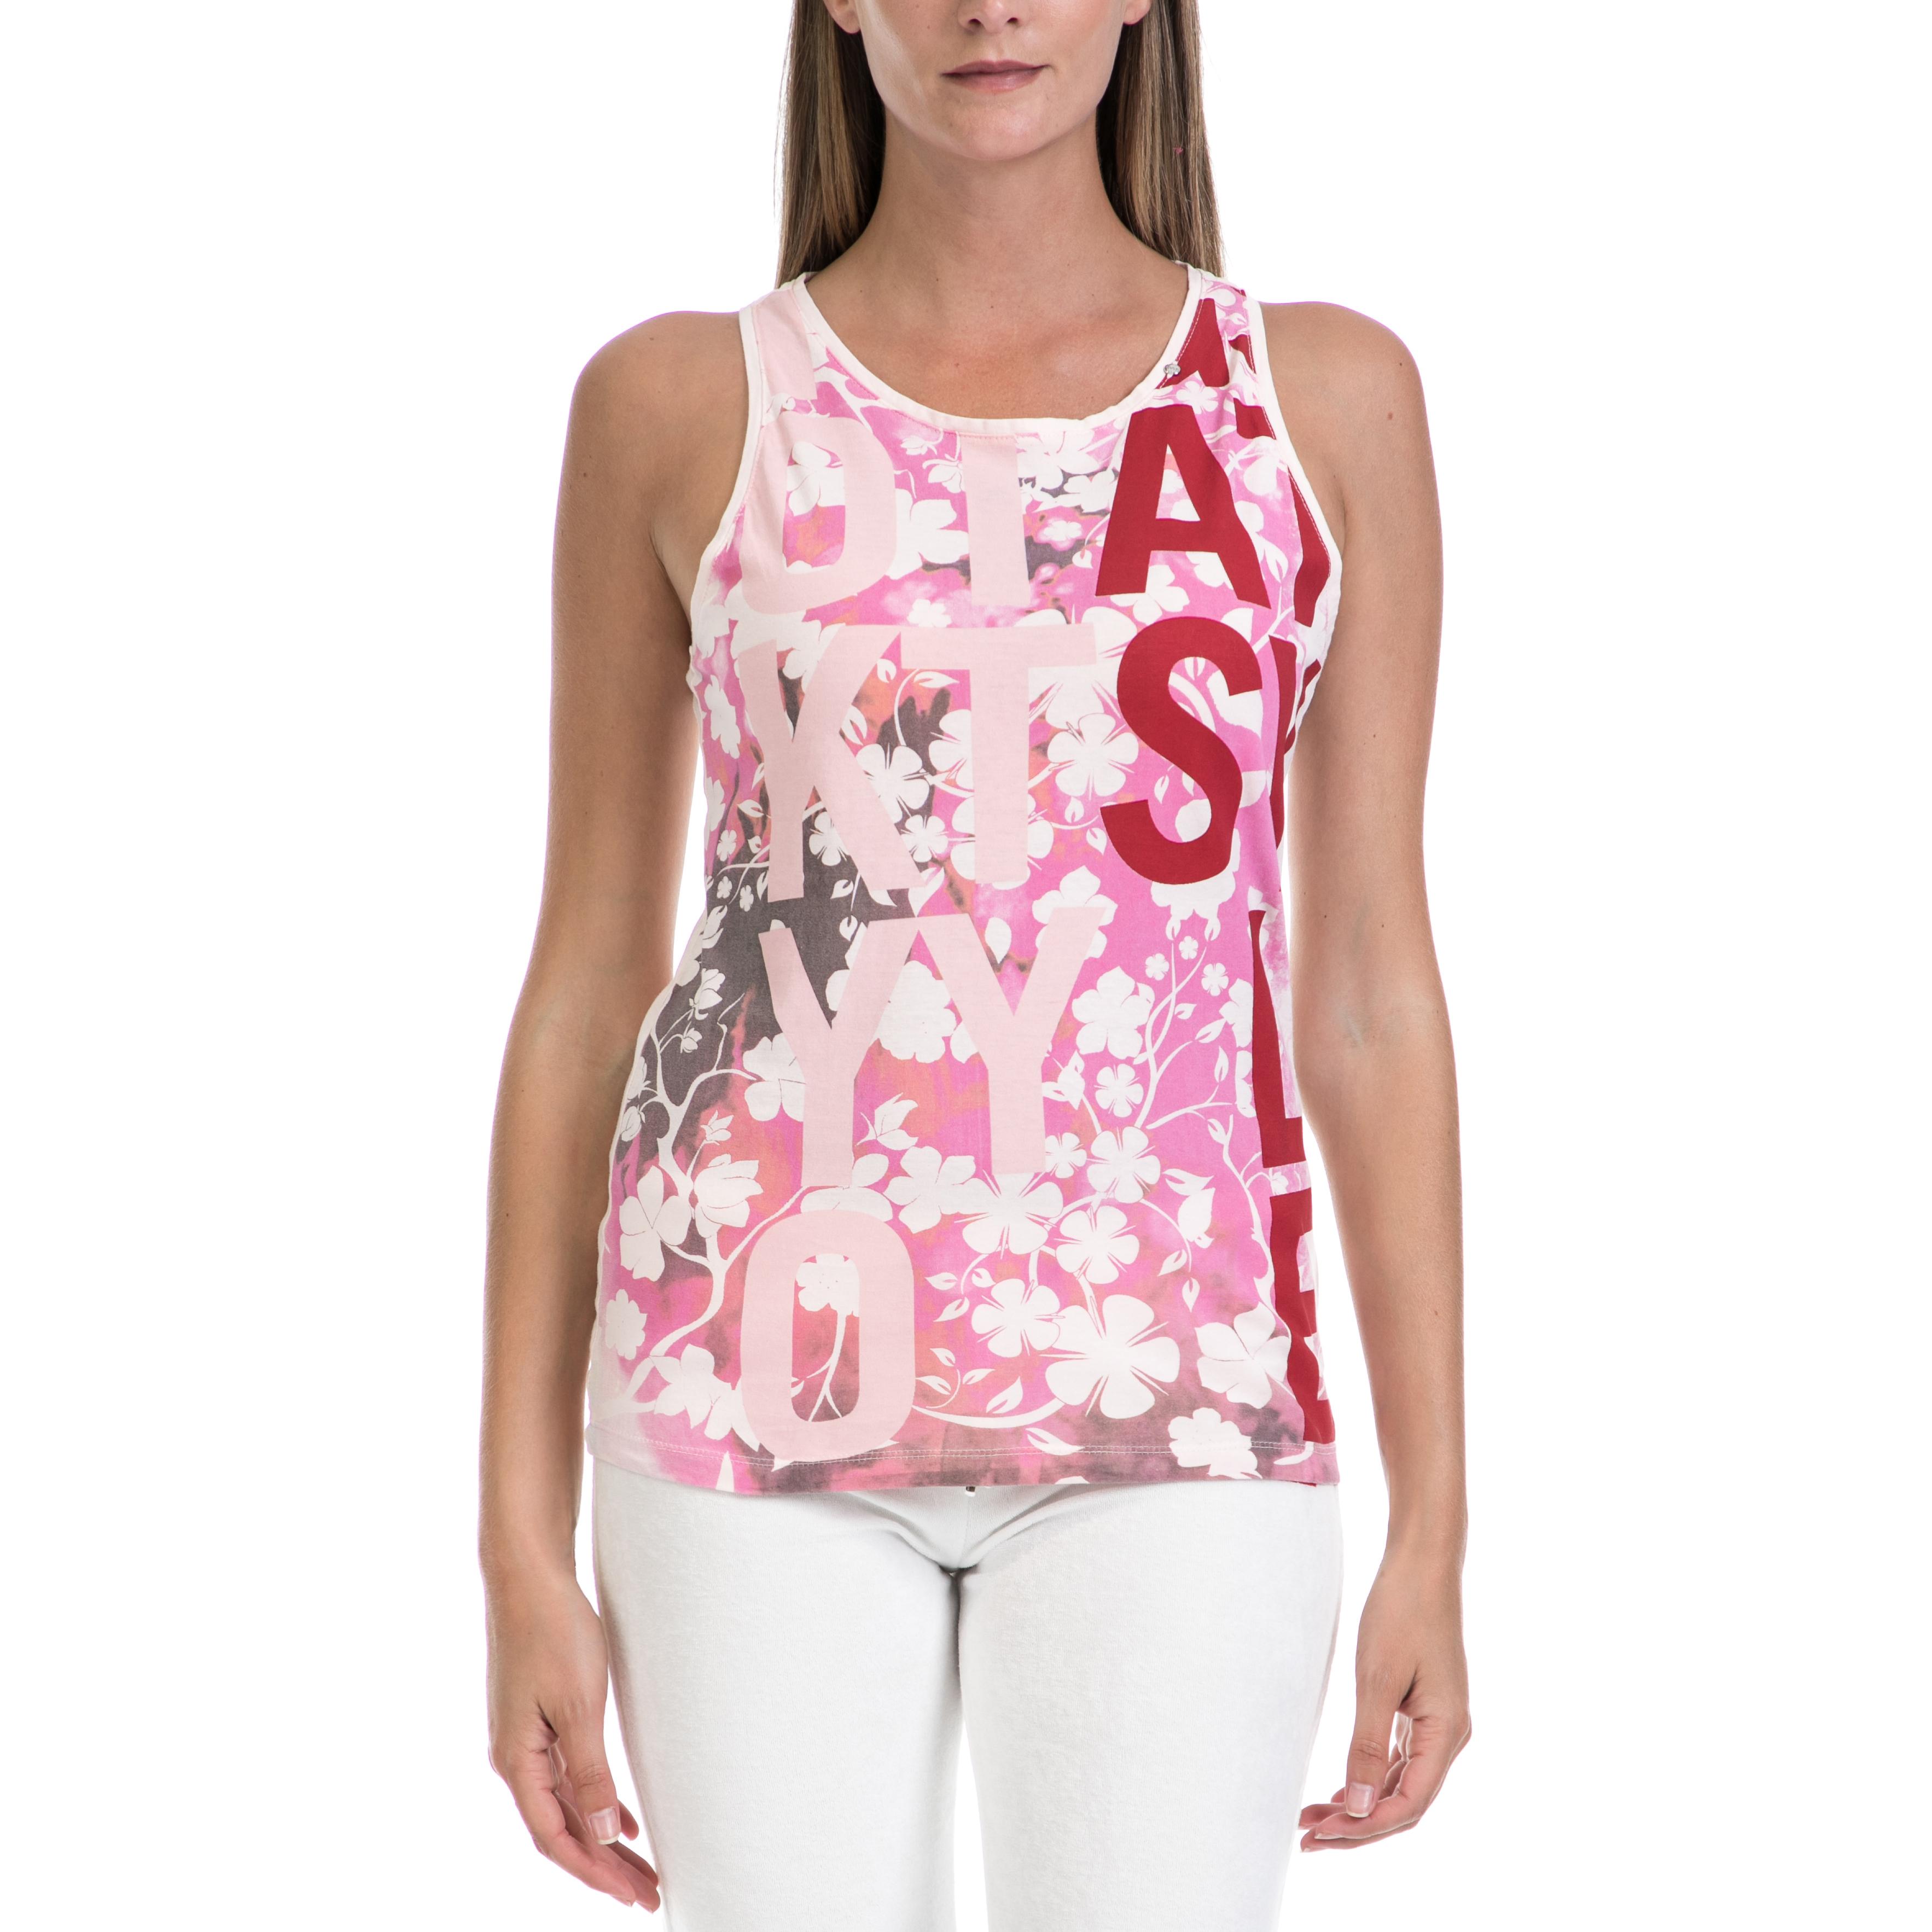 GAS - Γυναικεία μπλούζα GAS άσπρη-ροζ γυναικεία ρούχα μπλούζες αμάνικες